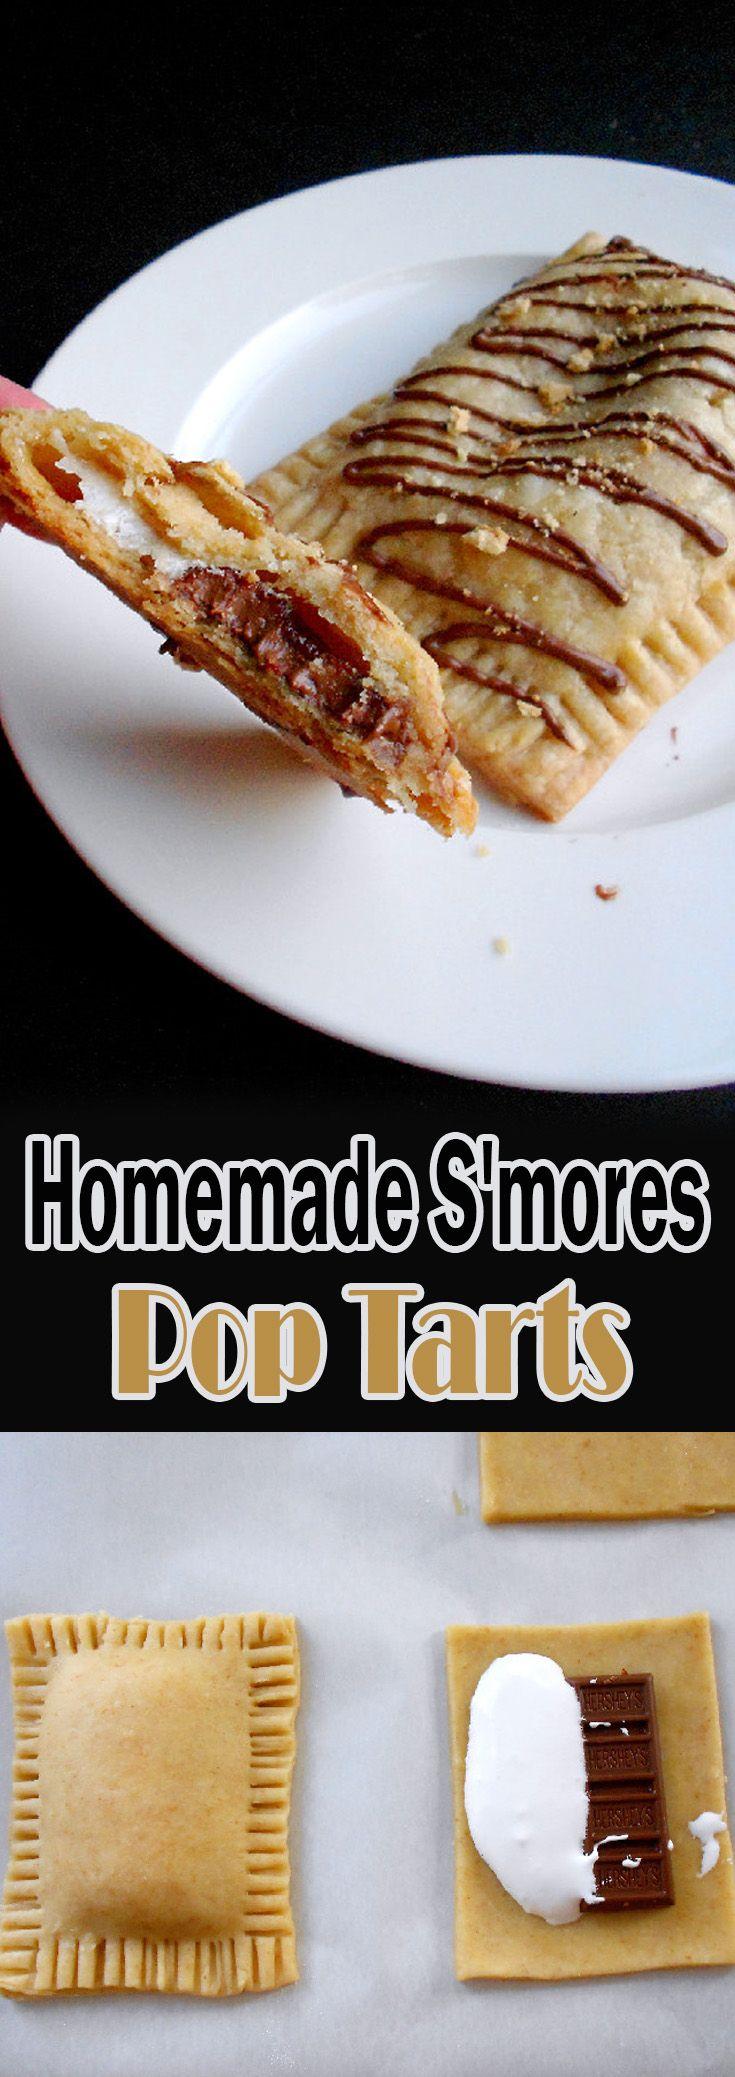 Homemade S'mores Pop Tarts                                                                                                                                                                                 More